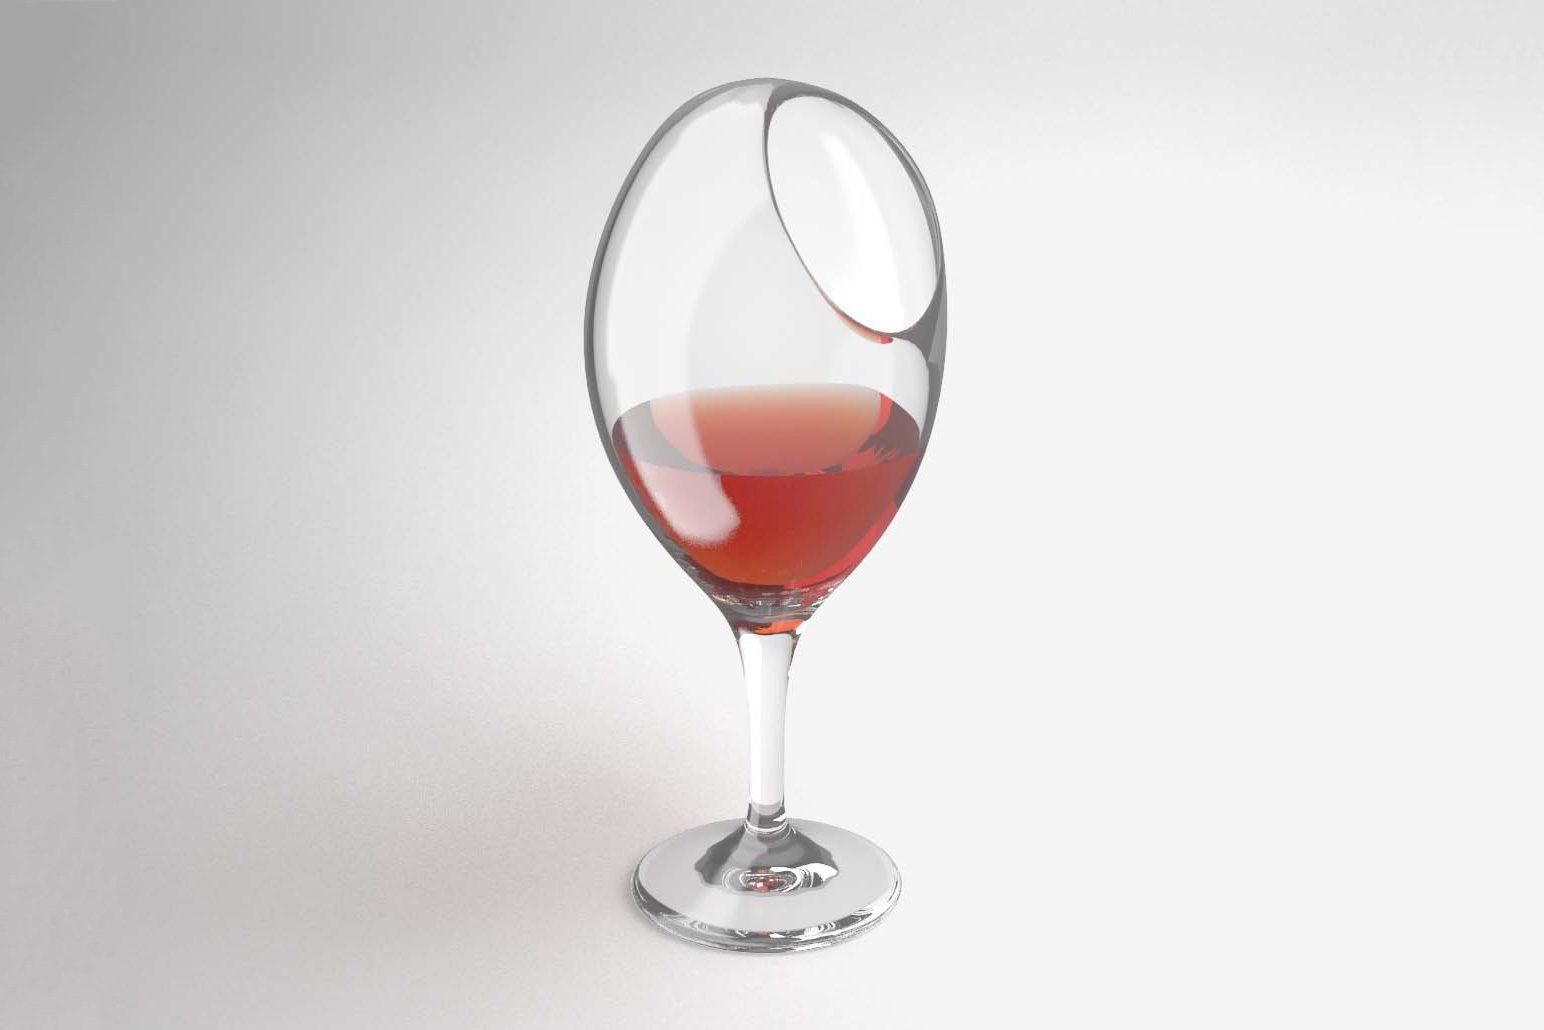 the uncomfortable wine glass Courtesy Katerina Kamprani